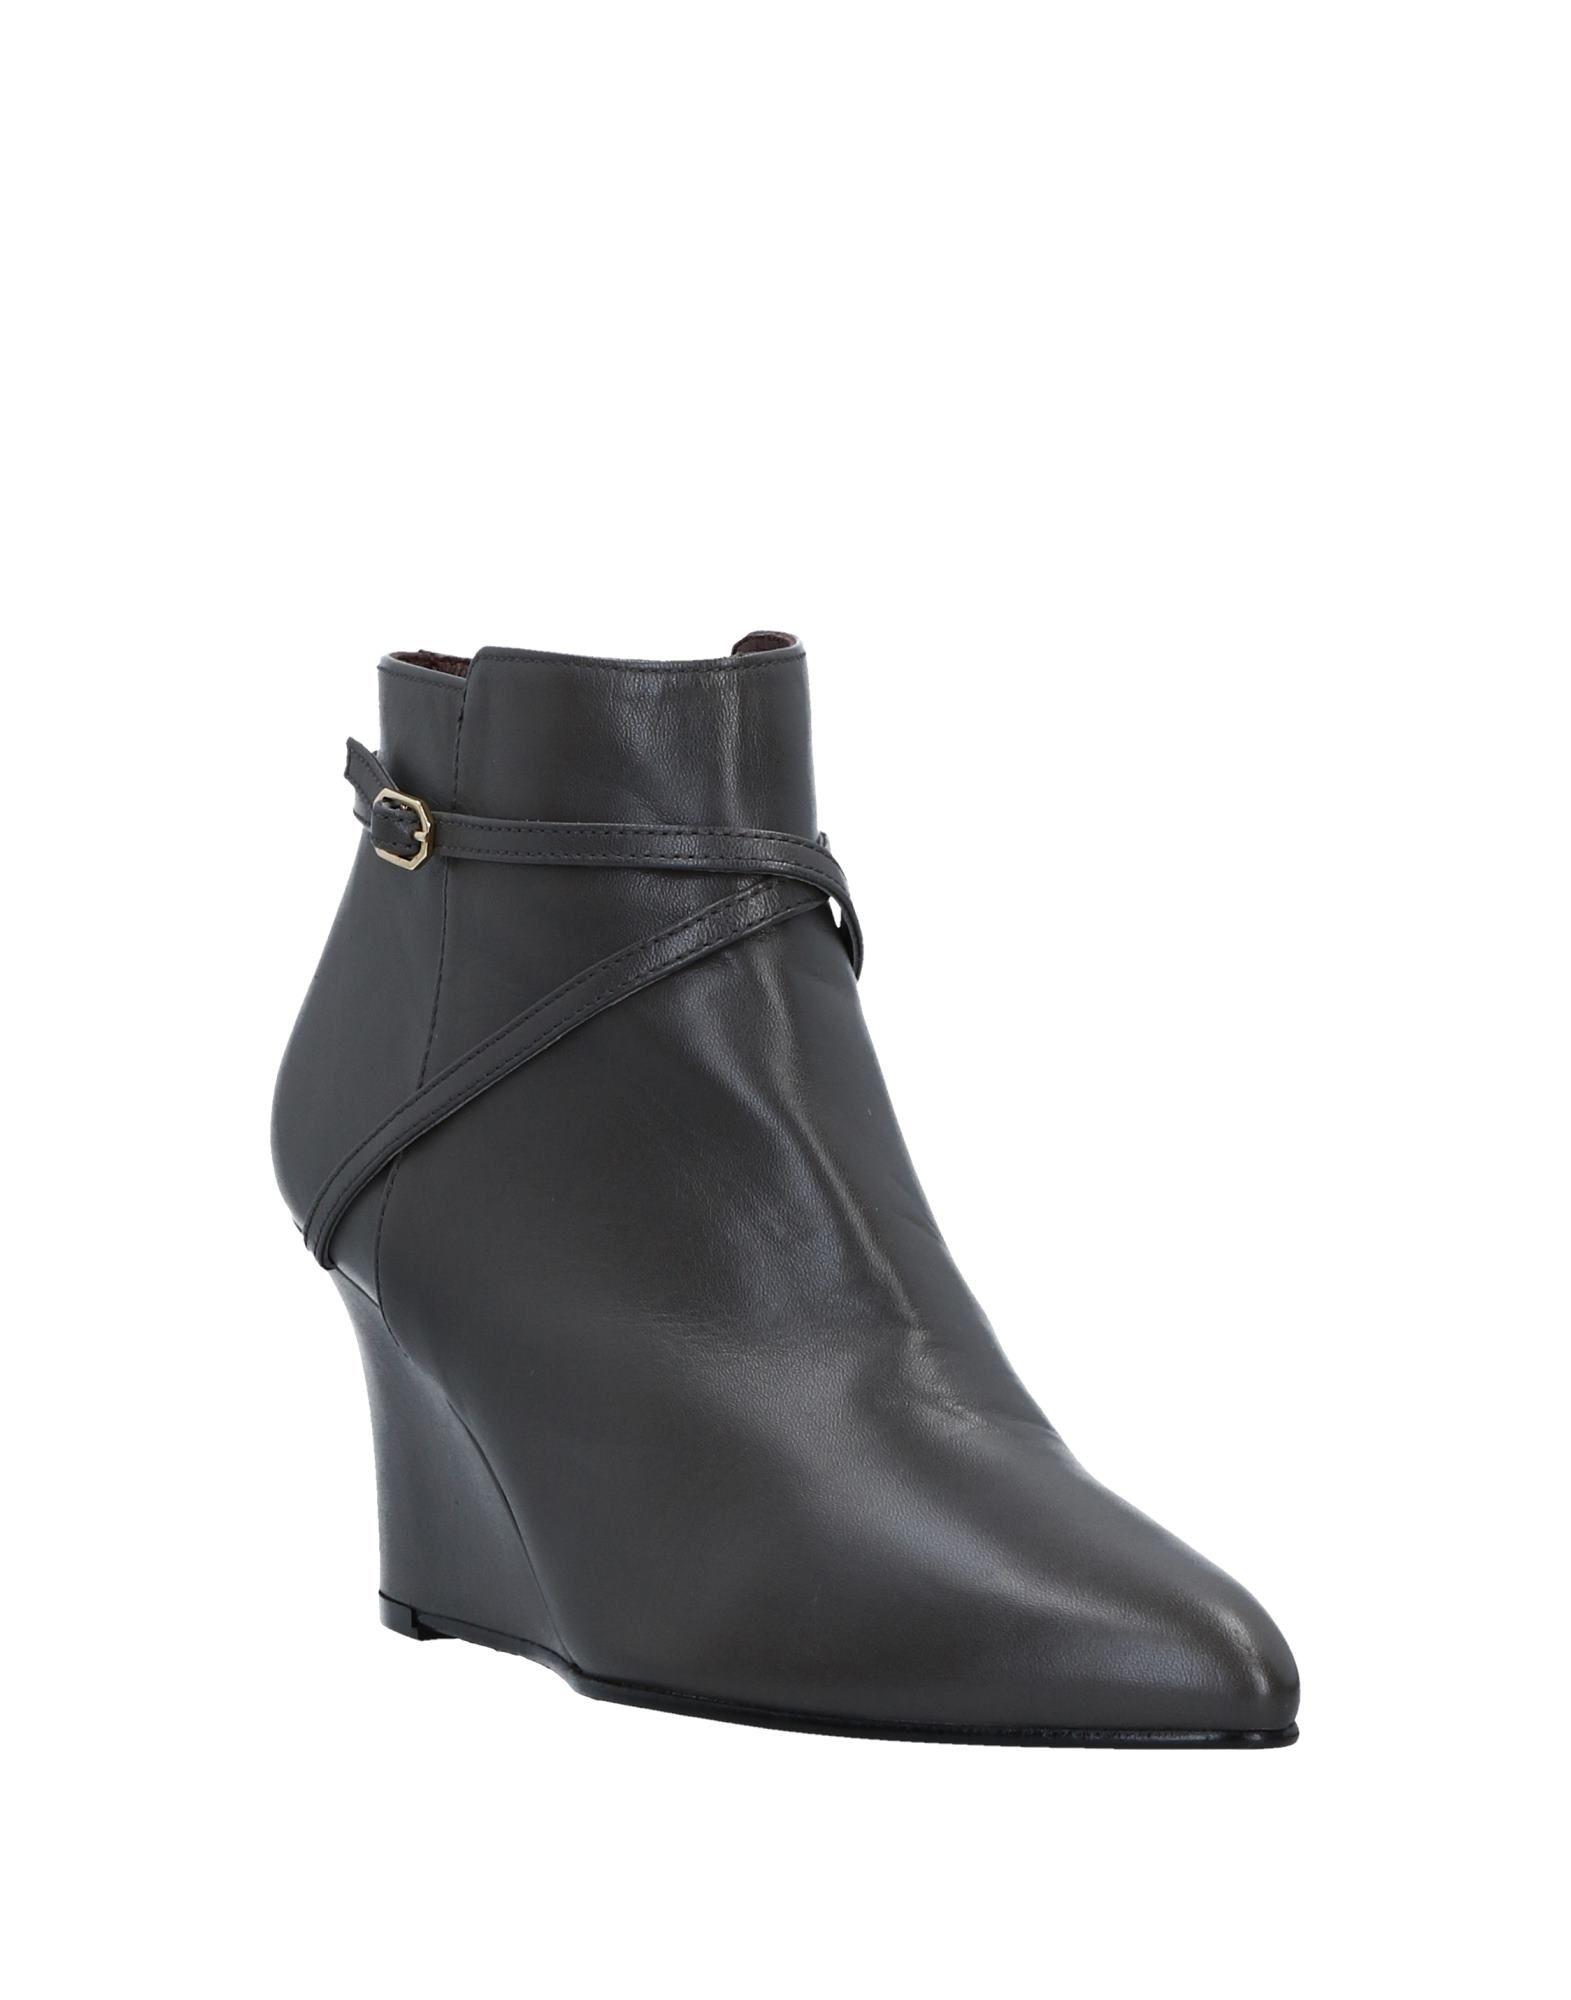 Avril Gau 11539355KKGut Stiefelette Damen  11539355KKGut Gau aussehende strapazierfähige Schuhe 86ed94